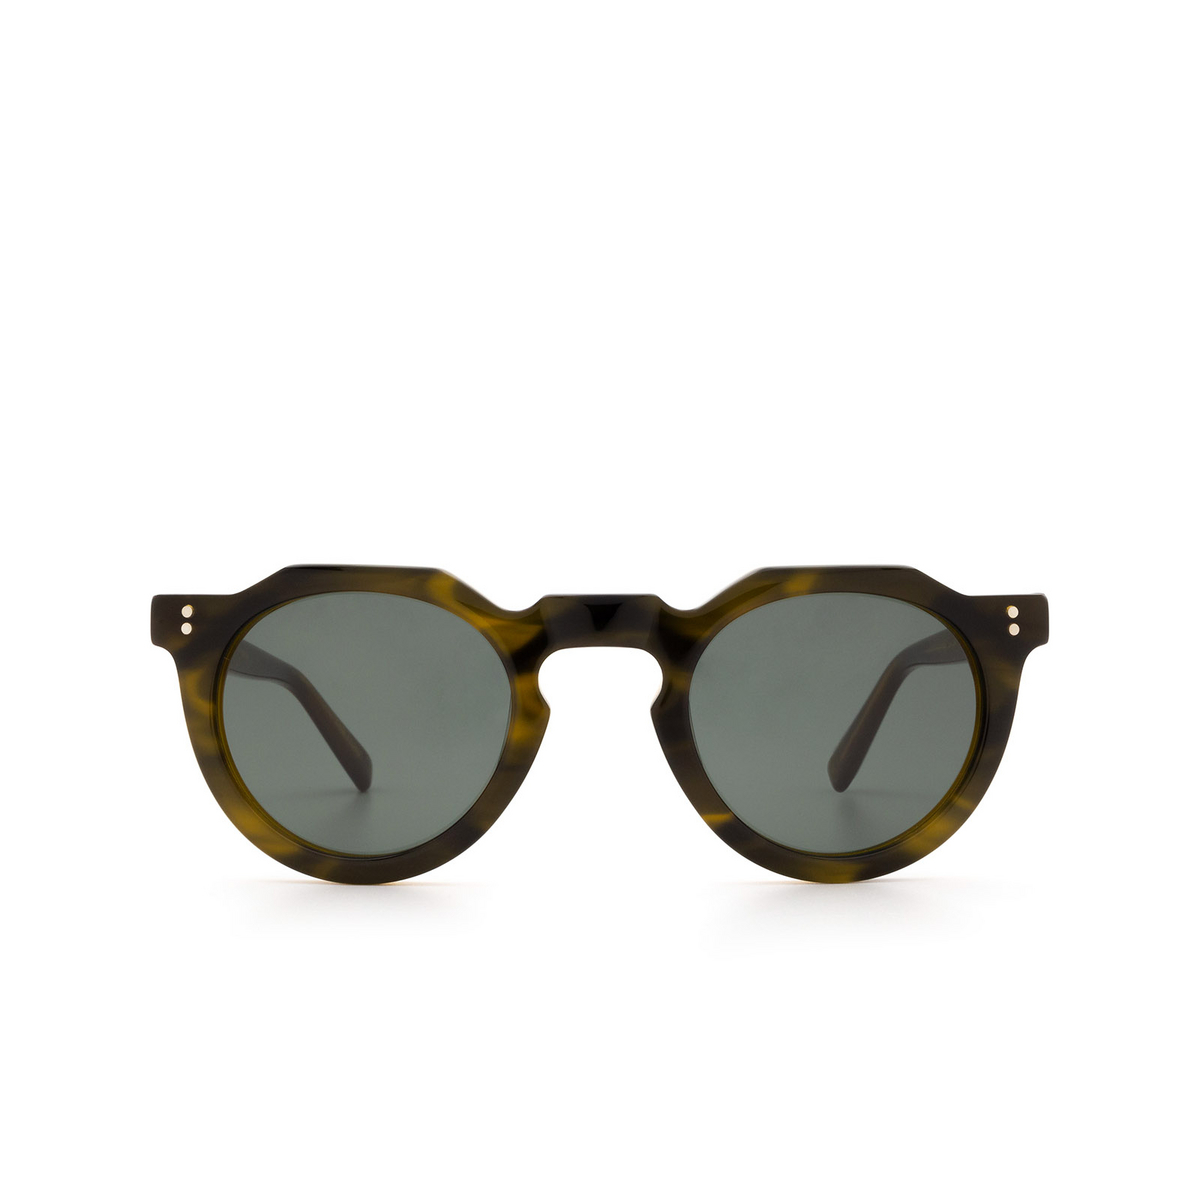 Lesca® Irregular Sunglasses: Picas color Khaki - front view.